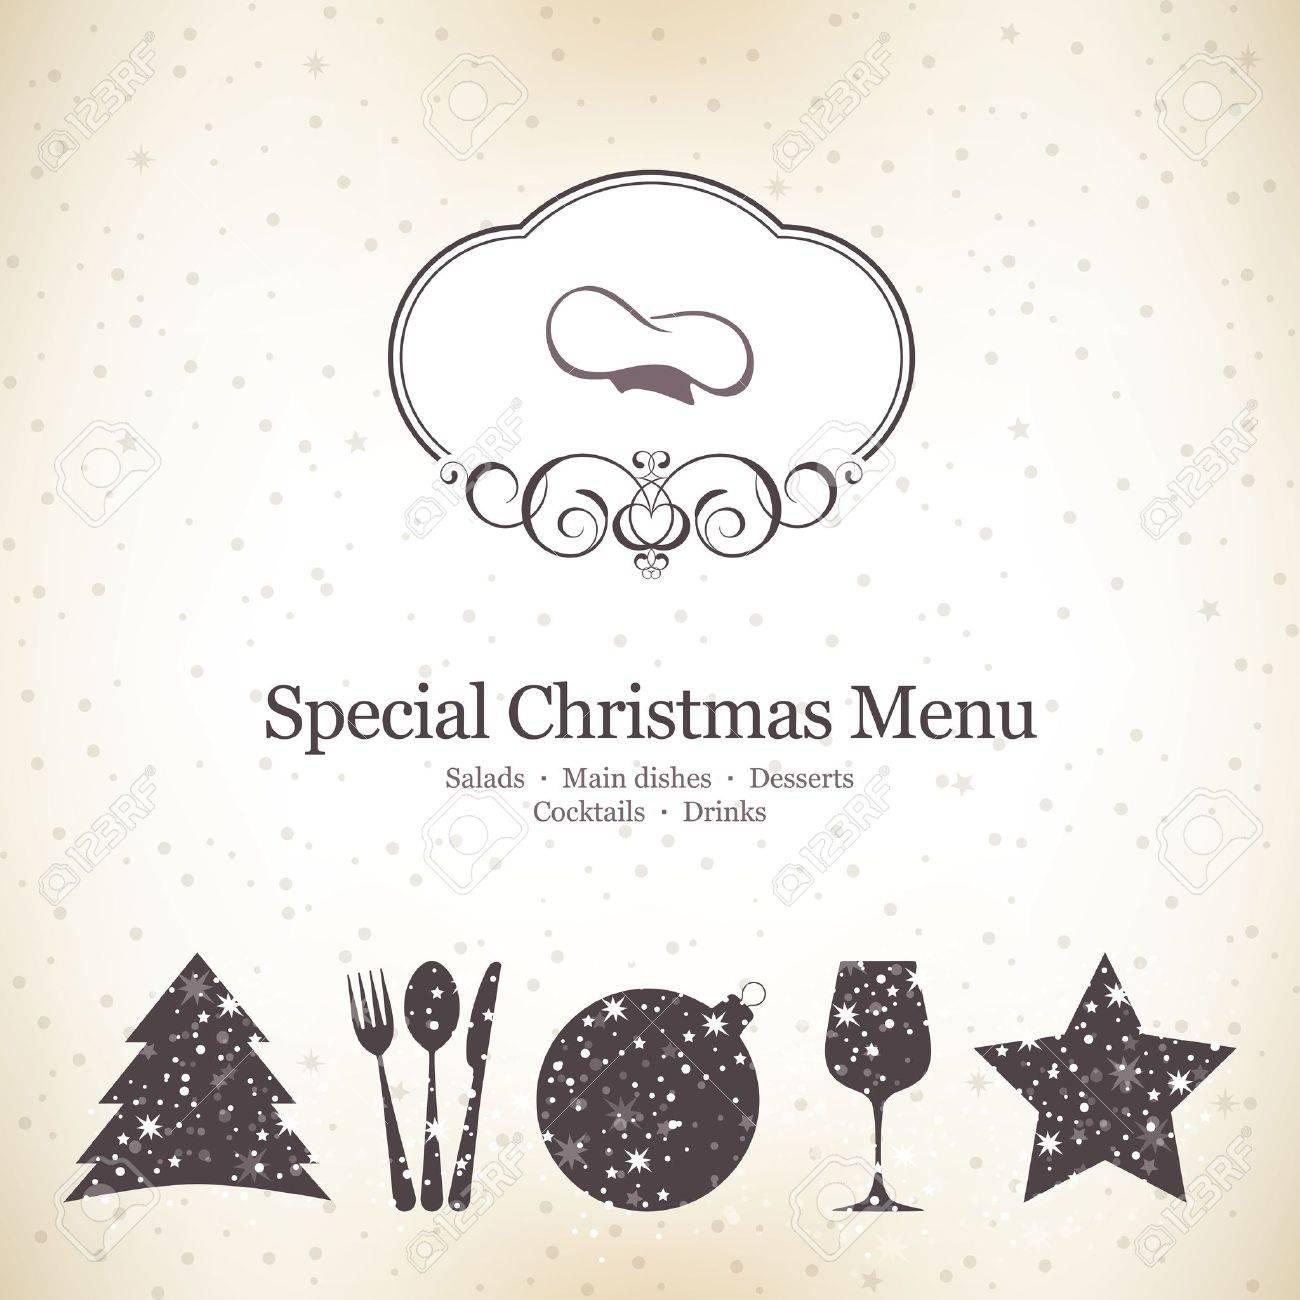 special christmas menu design royalty cliparts vectors and special christmas menu design stock vector 14957858